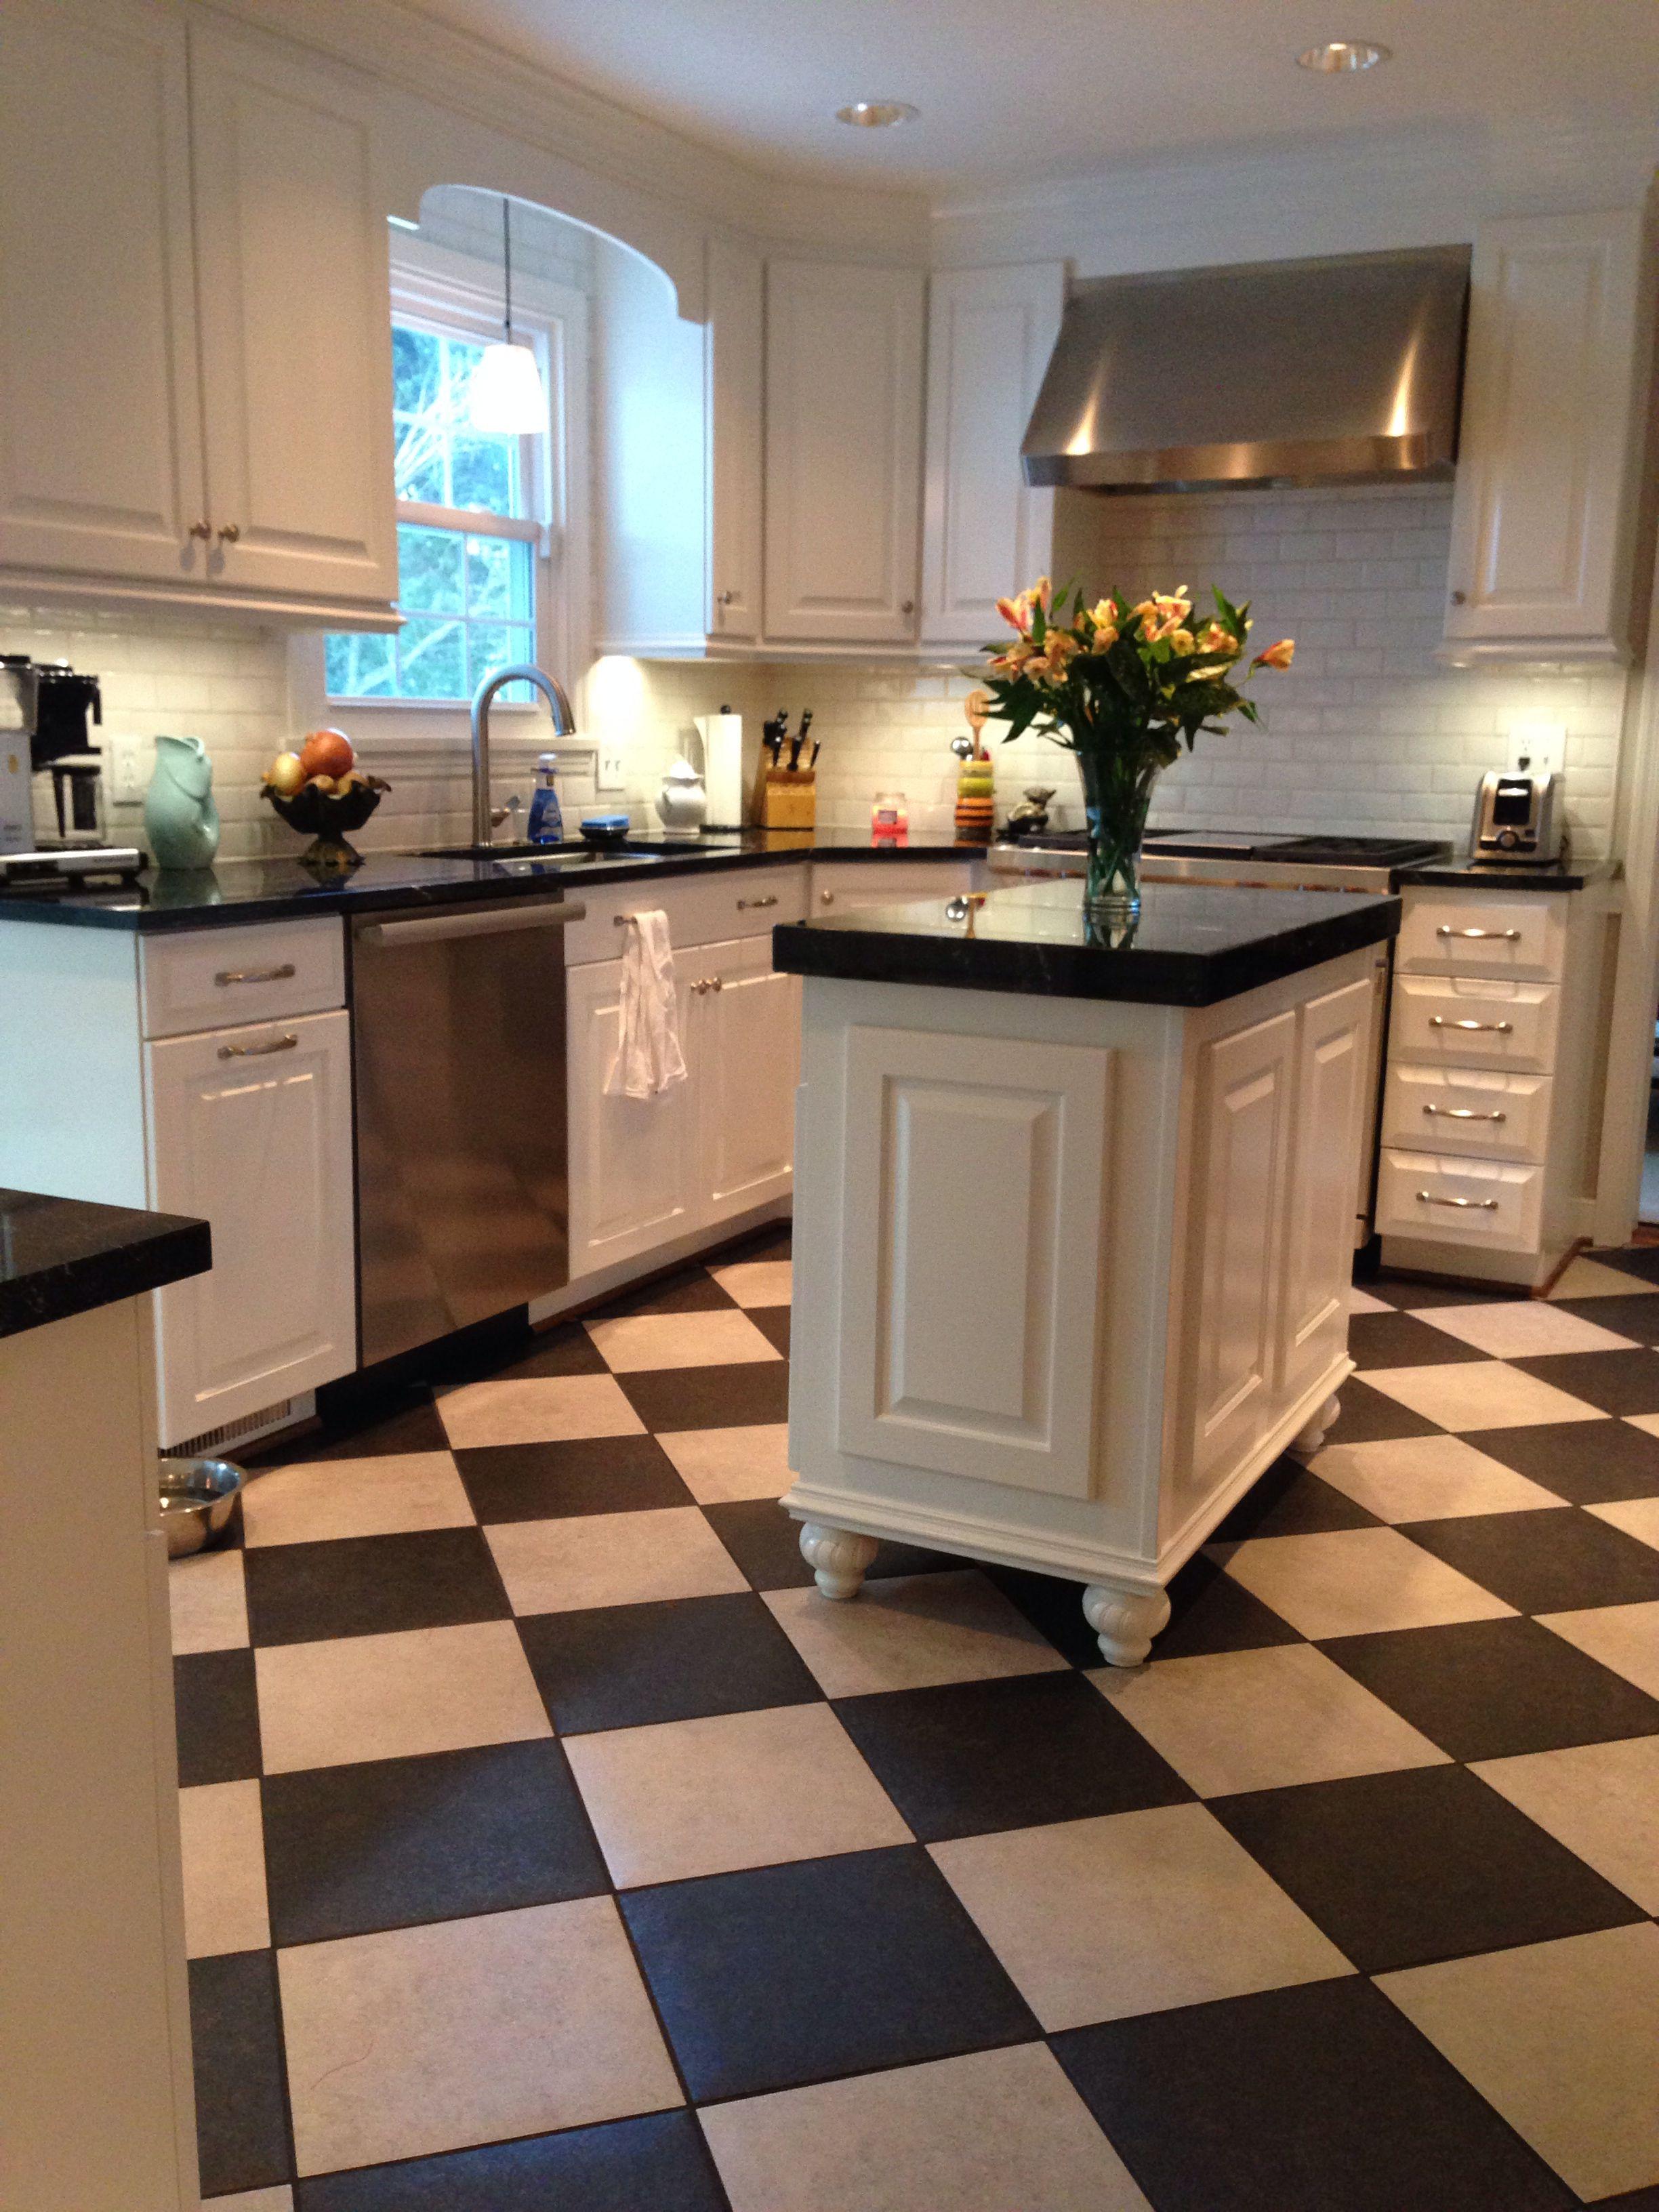 Black And White Kitchen Milky Way Granite Checker Board Floor Gray And Black D Checkered Floor Kitchen White Cabinets Black Countertops Kitchen Counter Decor Black and white checkered kitchen floor